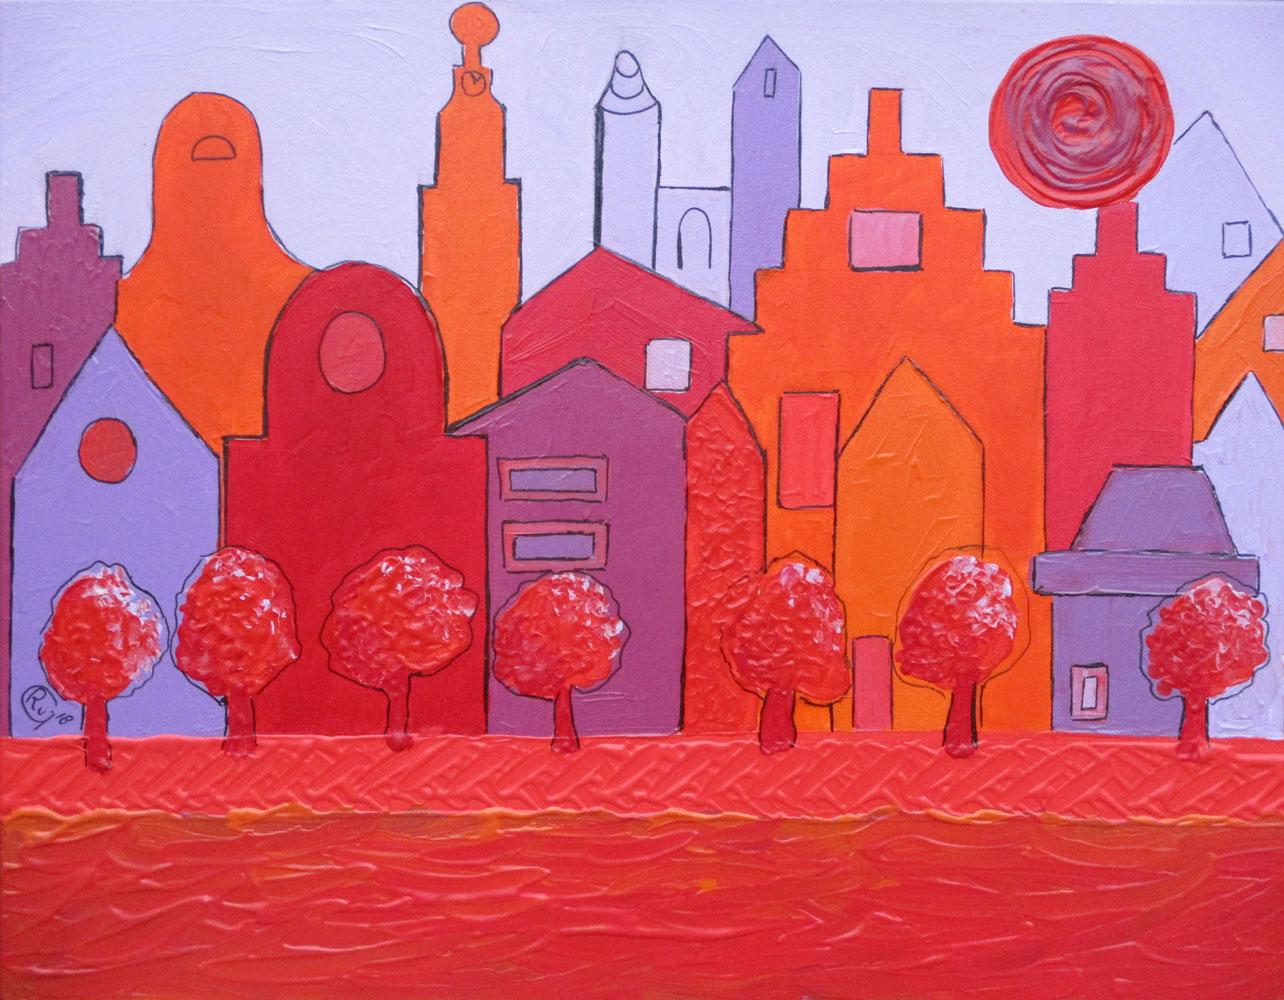 amsterdam-roze-oranje-paars